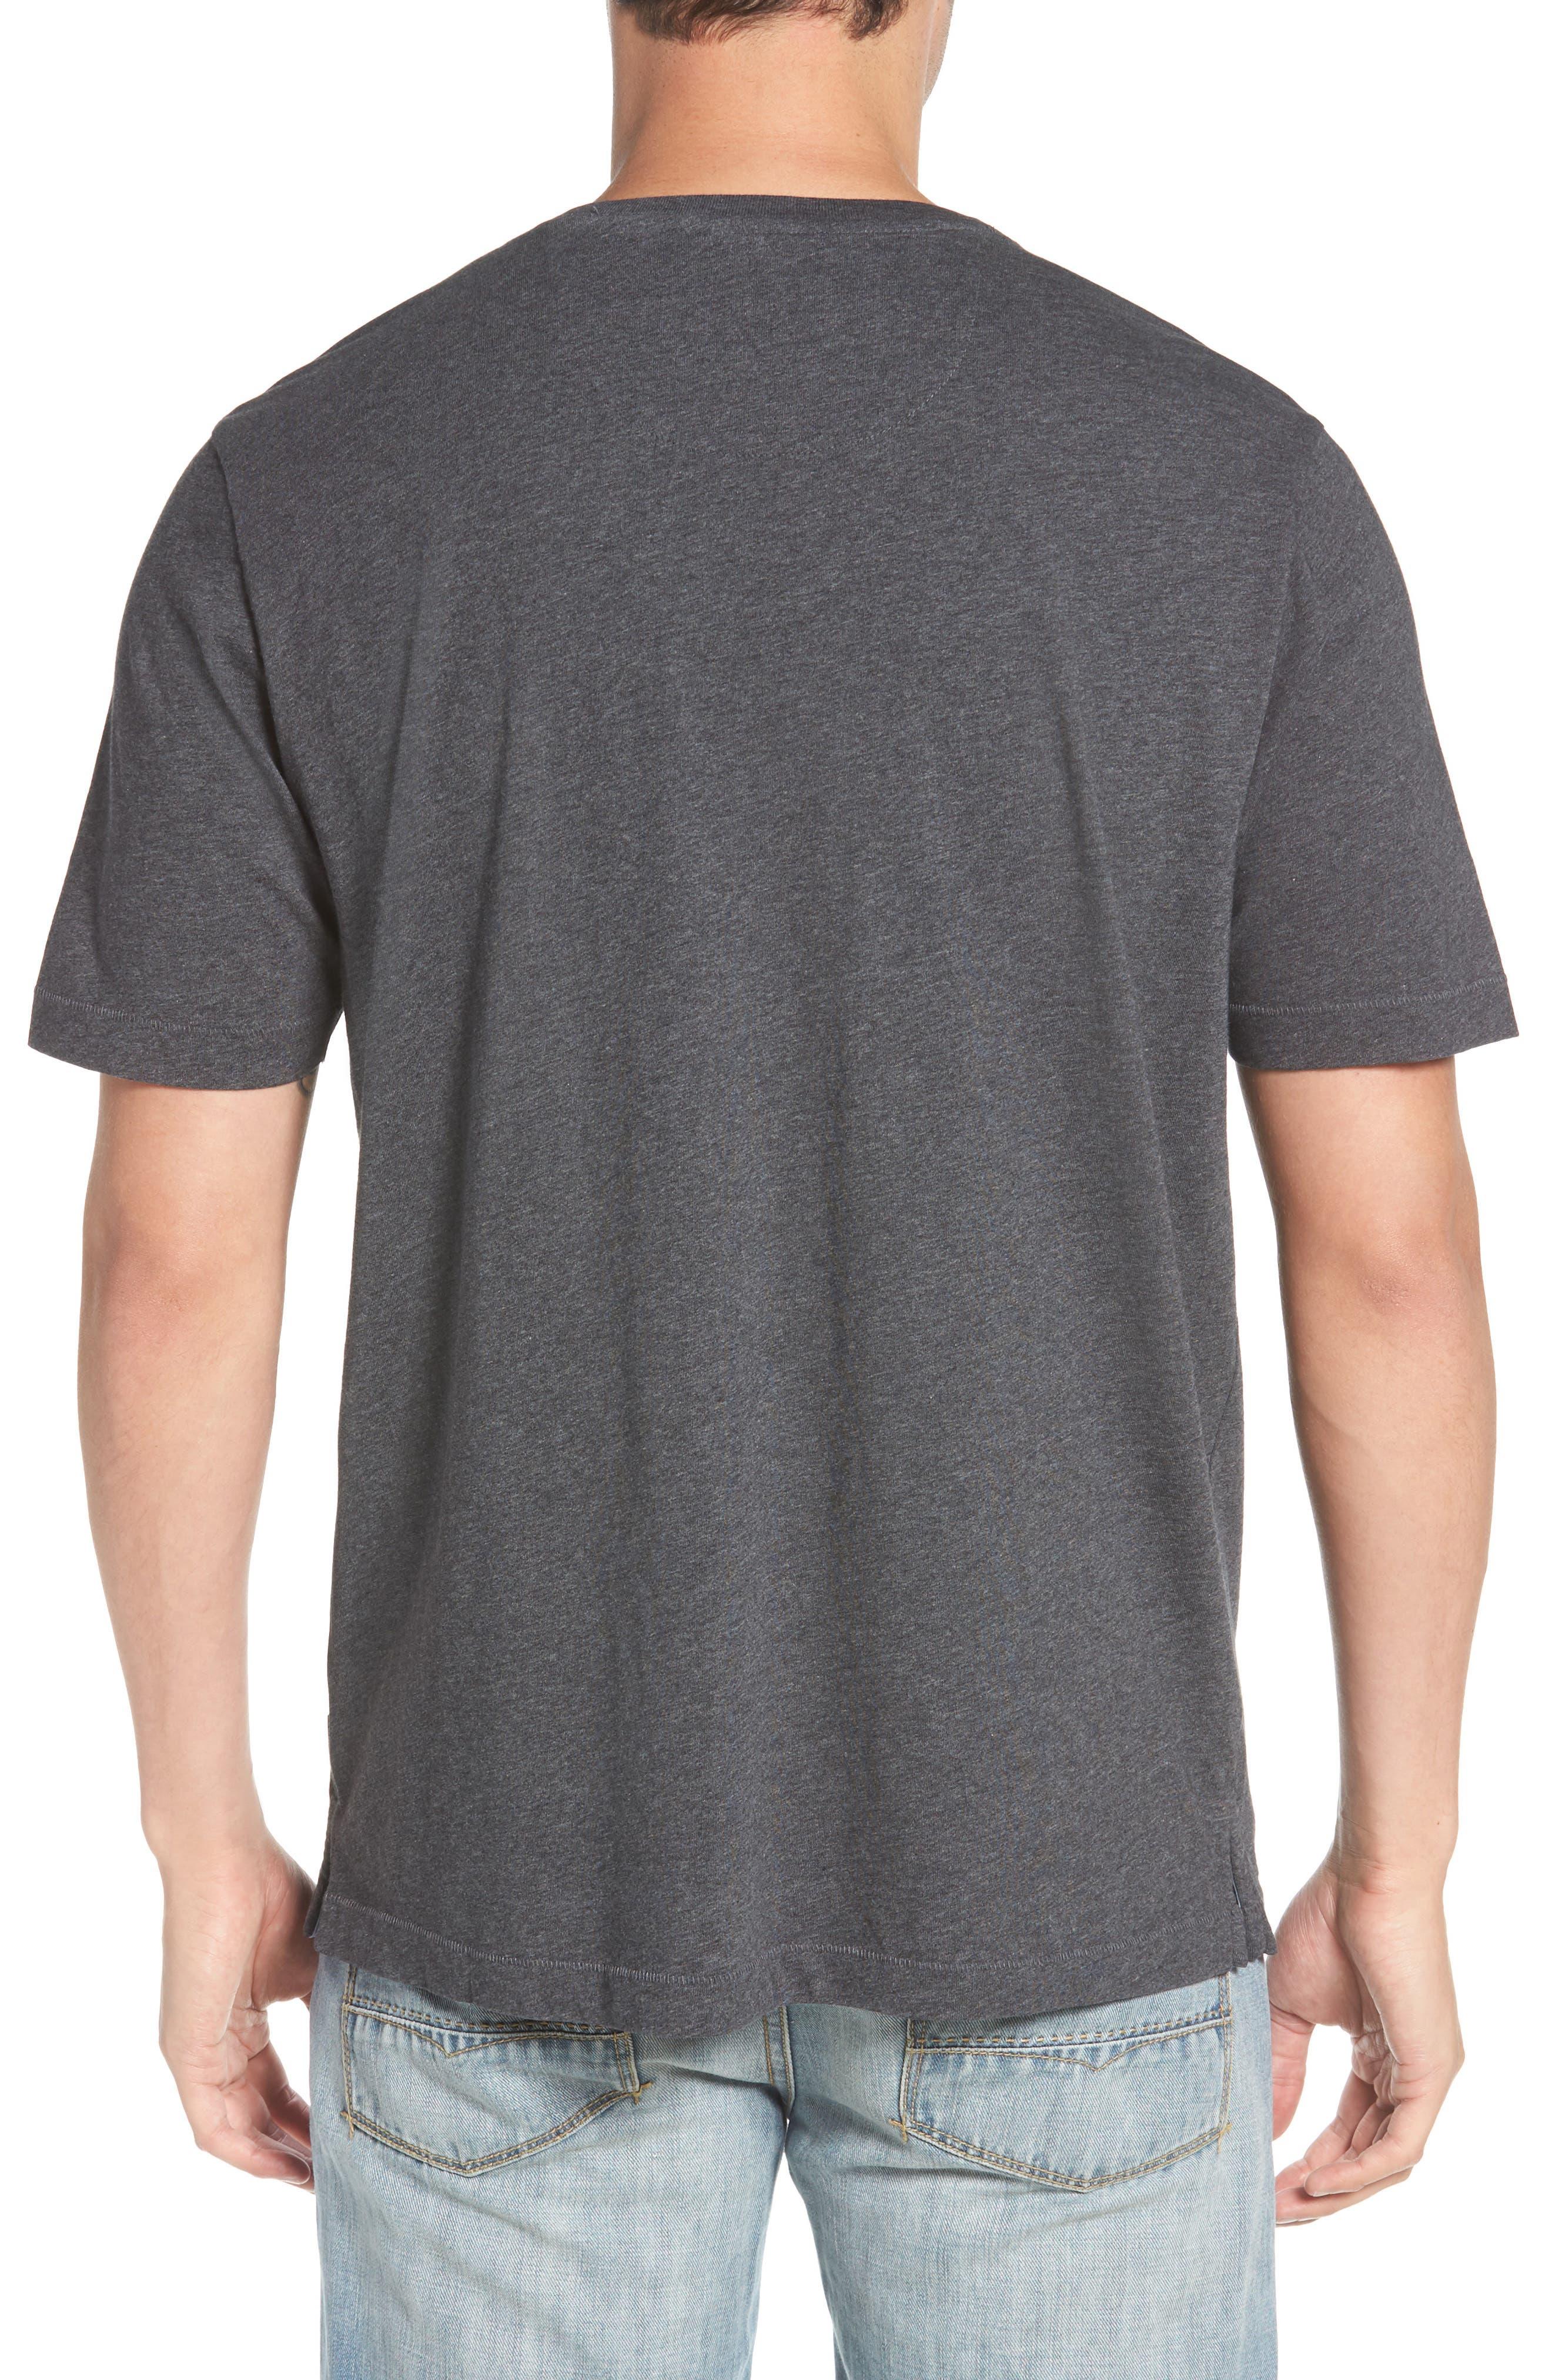 TOMMY BAHAMA, 'New Bali Sky' Original Fit Crewneck Pocket T-Shirt, Alternate thumbnail 2, color, CHARCOAL HEATHER